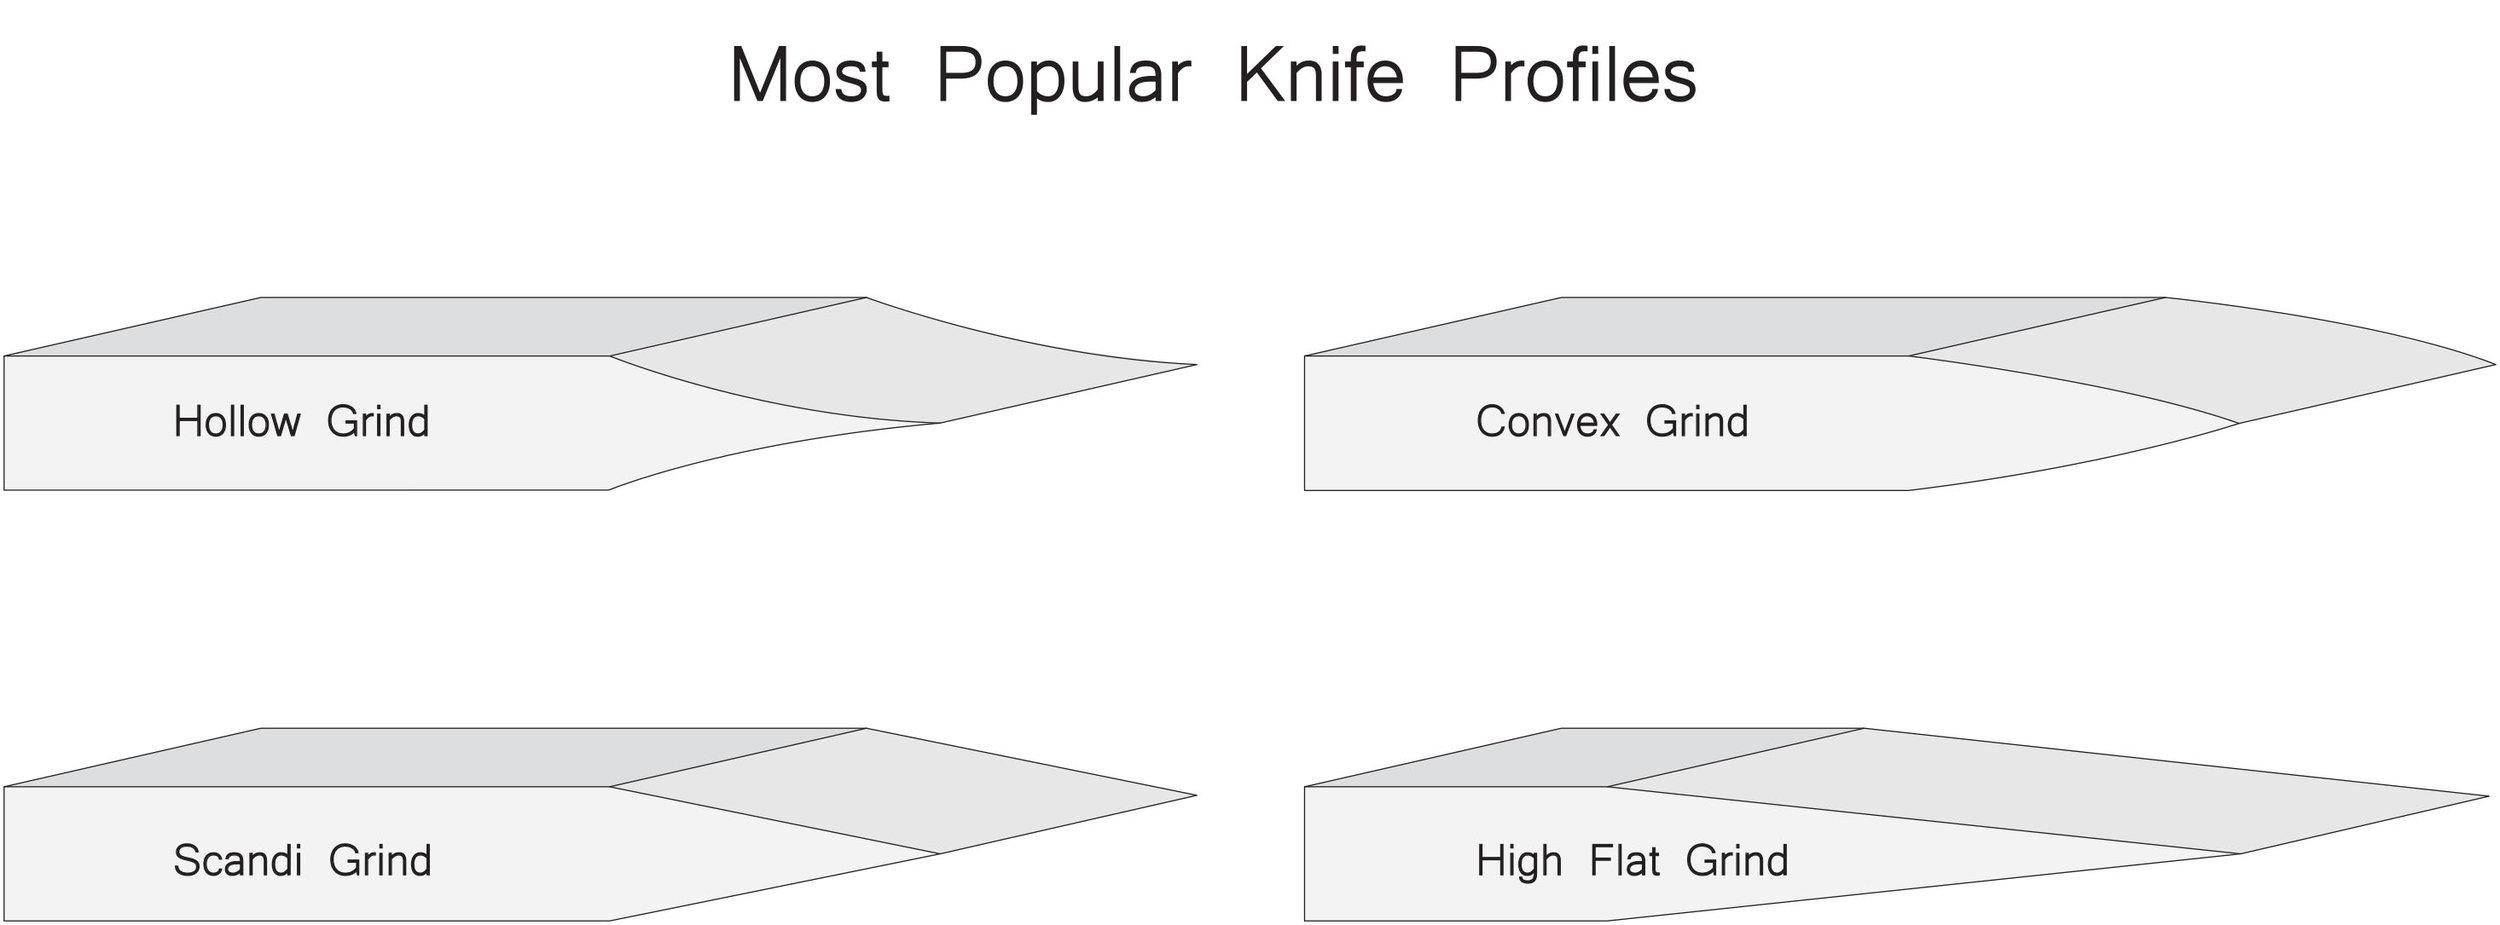 Knife Profiles.jpg